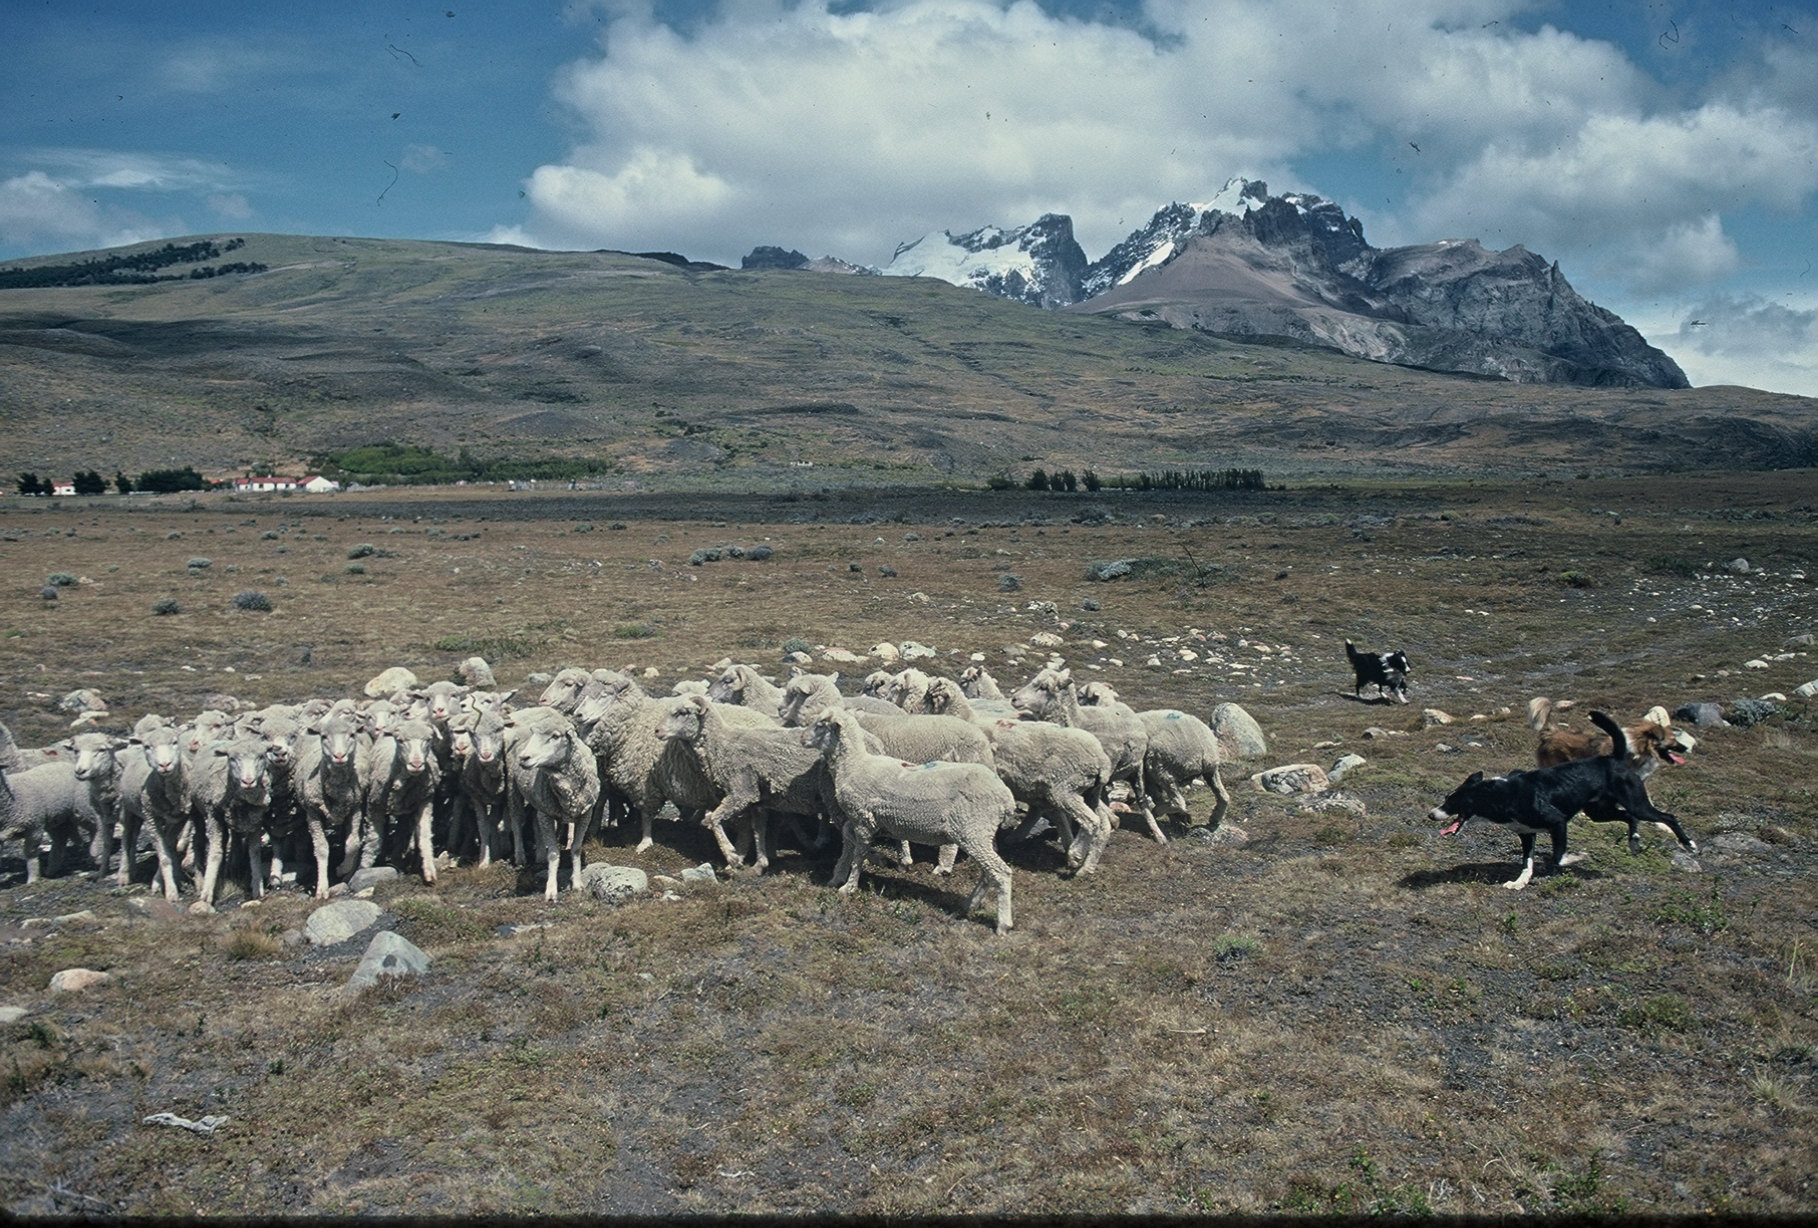 Patagonia.LagoViedma.EstanciaDosHermanos.Sheep:Dogs(1994).jpg